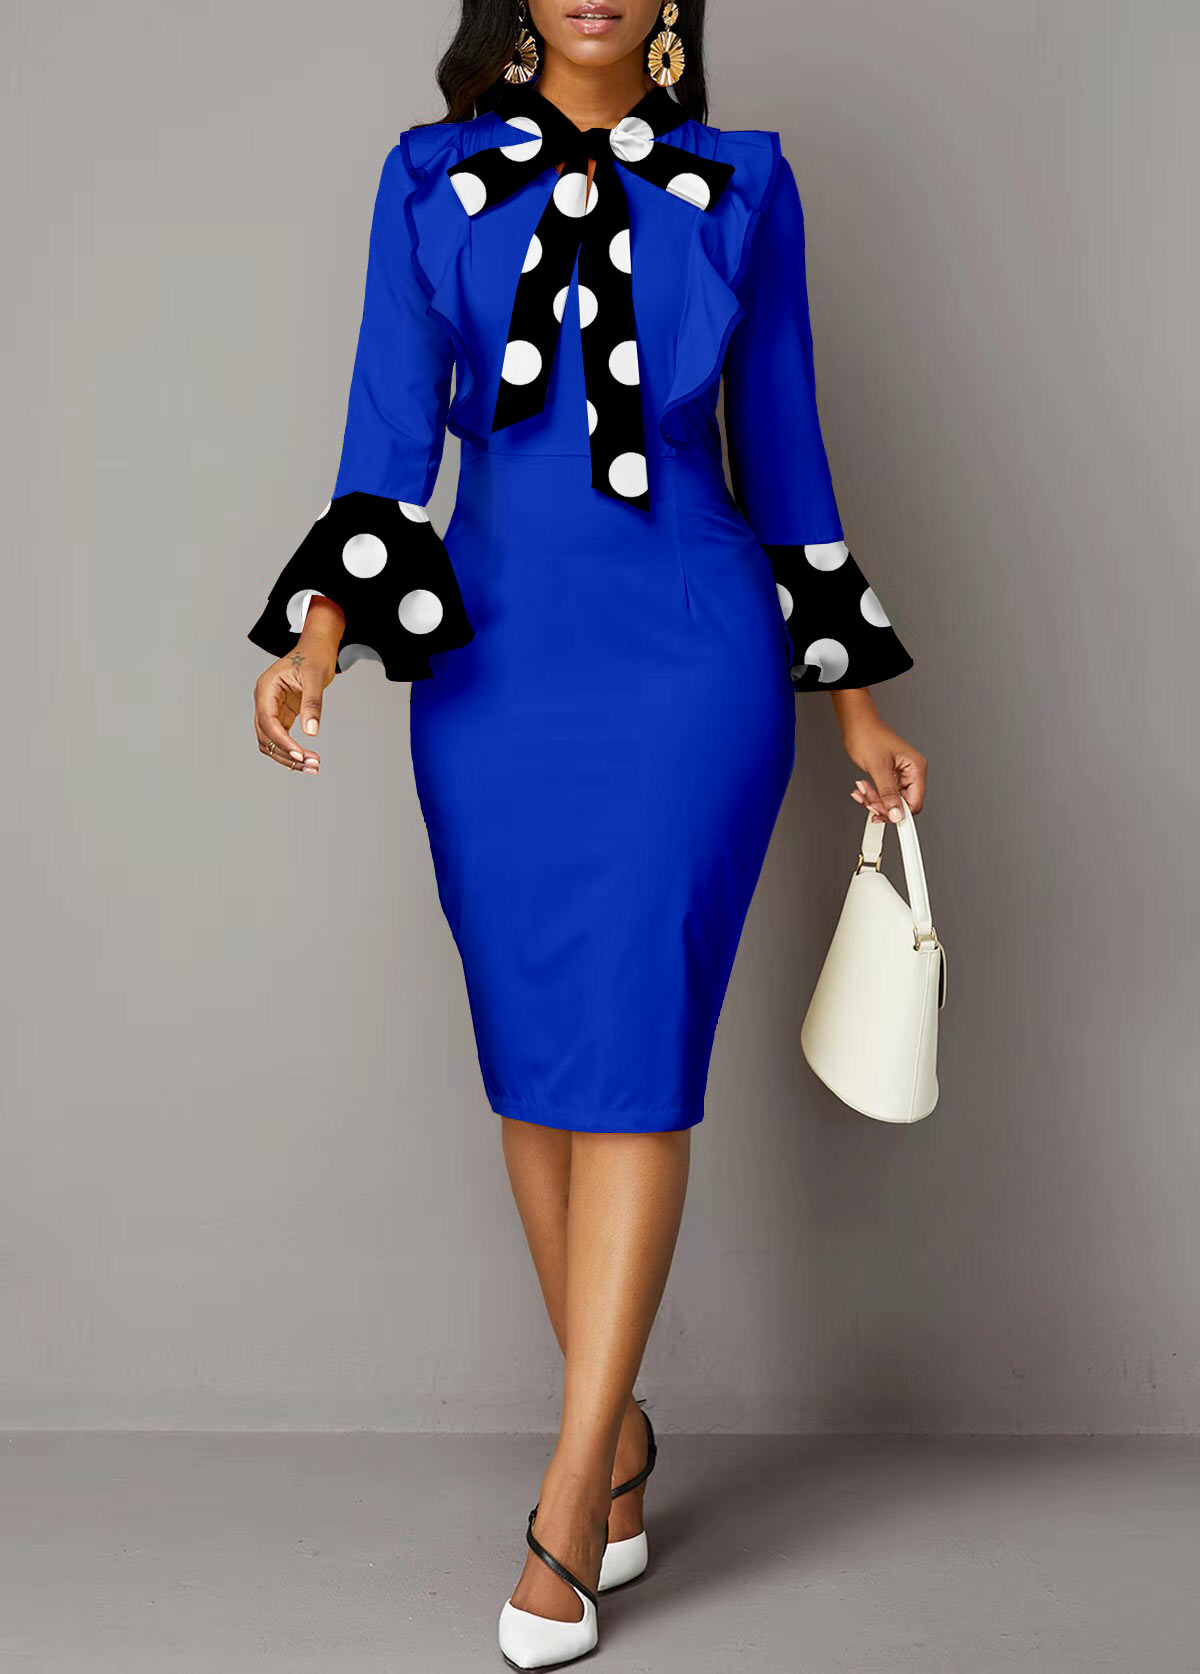 ROTITA Polka Dot Tie Long Sleeve Dress